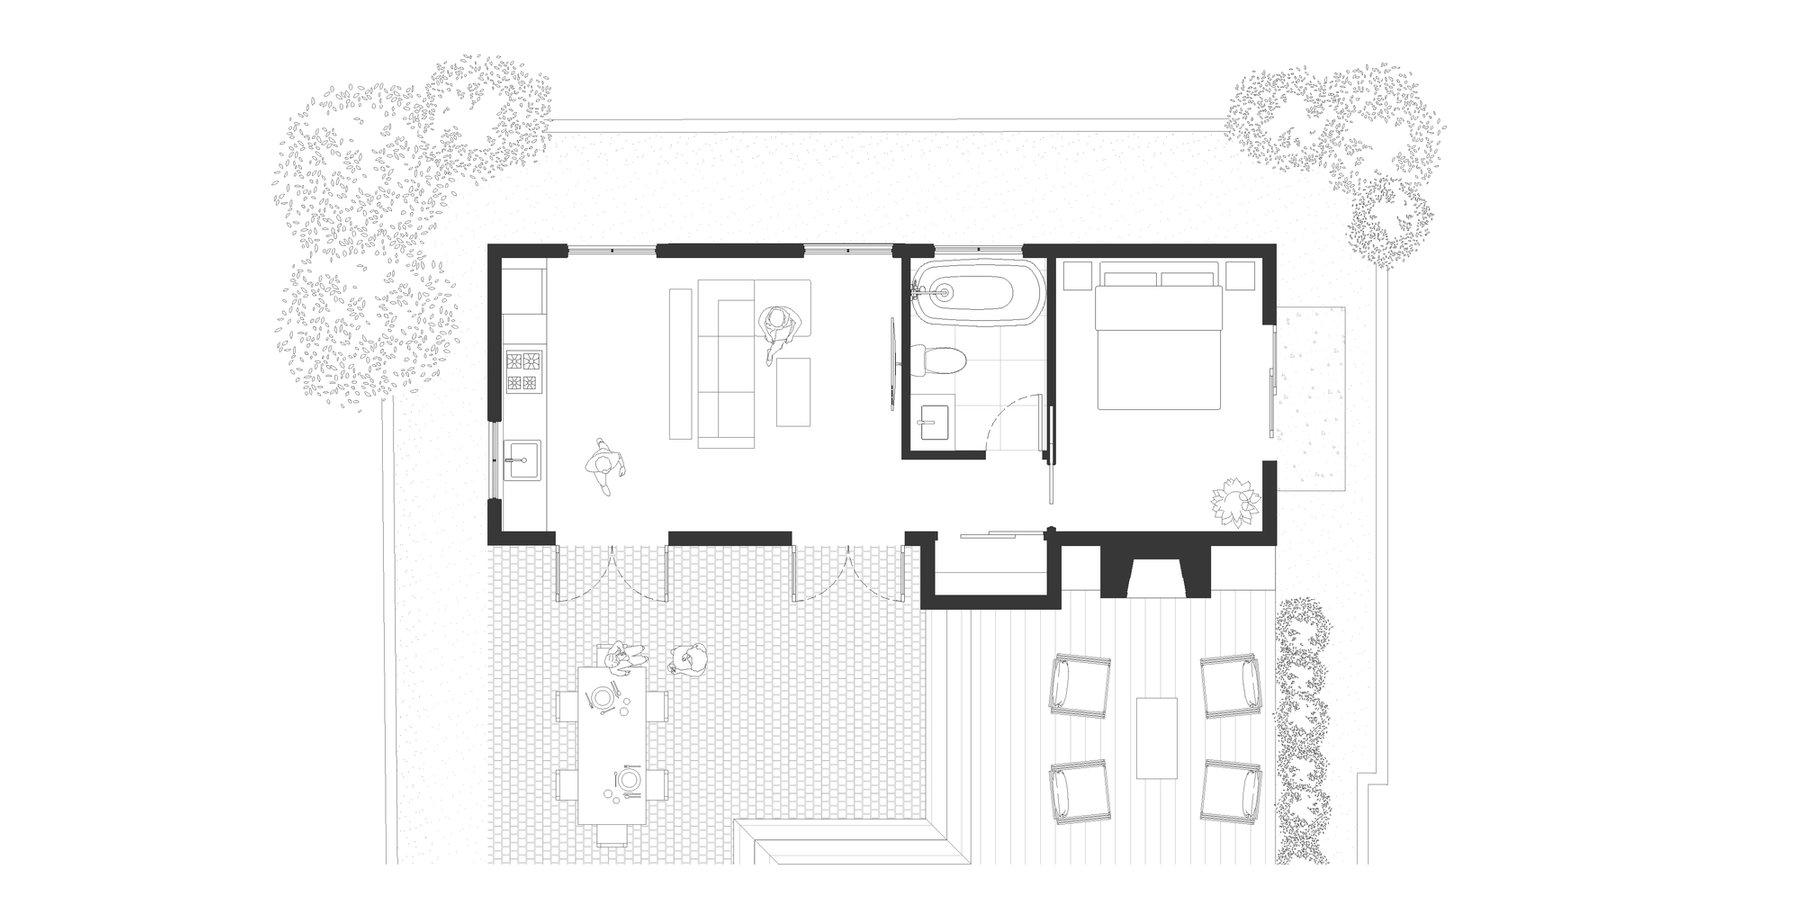 ADU Floor Plan